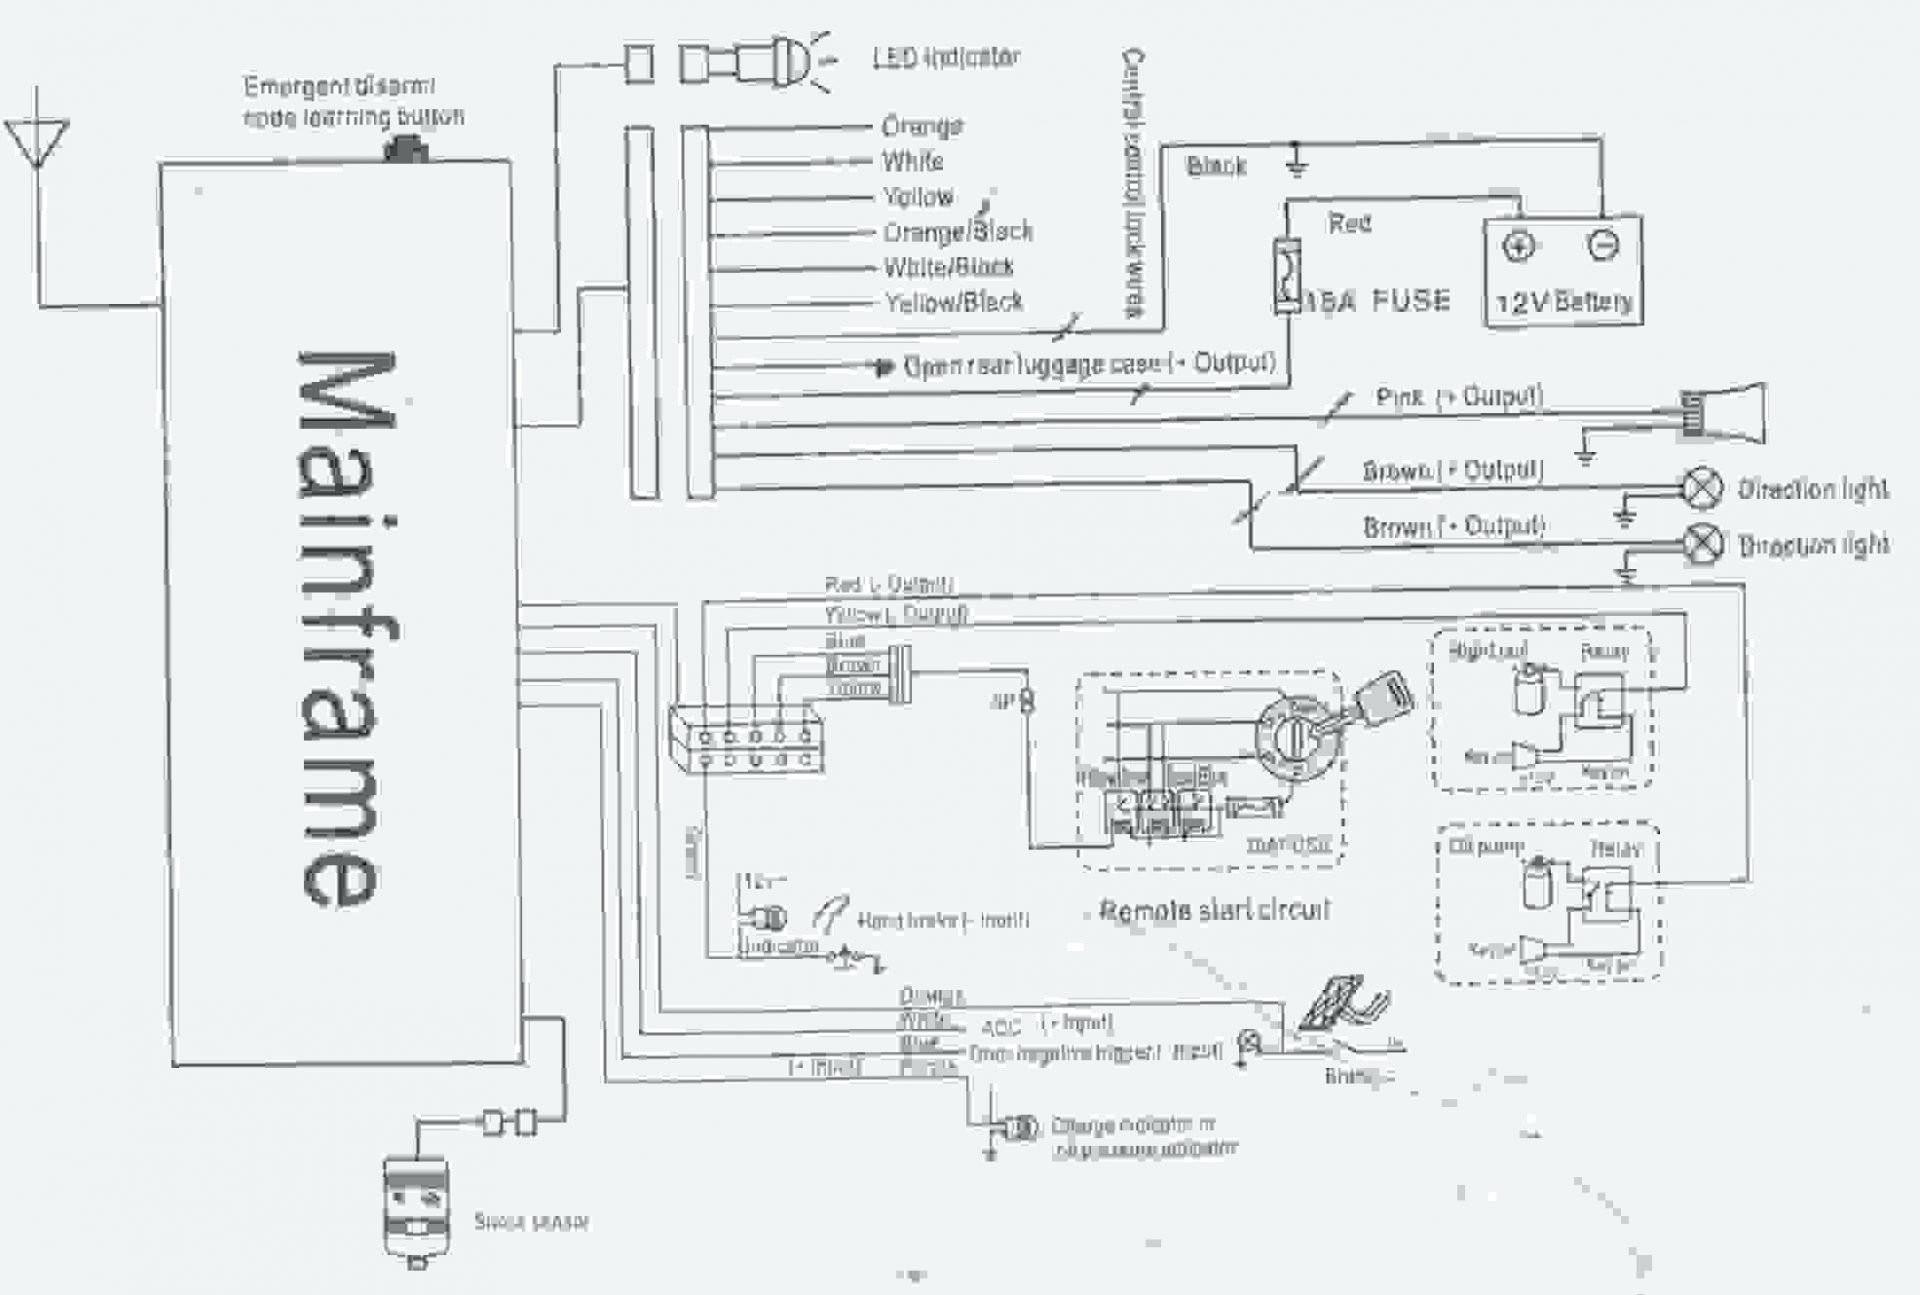 FE_9205] Viper 5704 Wiring Diagram Download DiagramXortanet Emba Mohammedshrine Librar Wiring 101